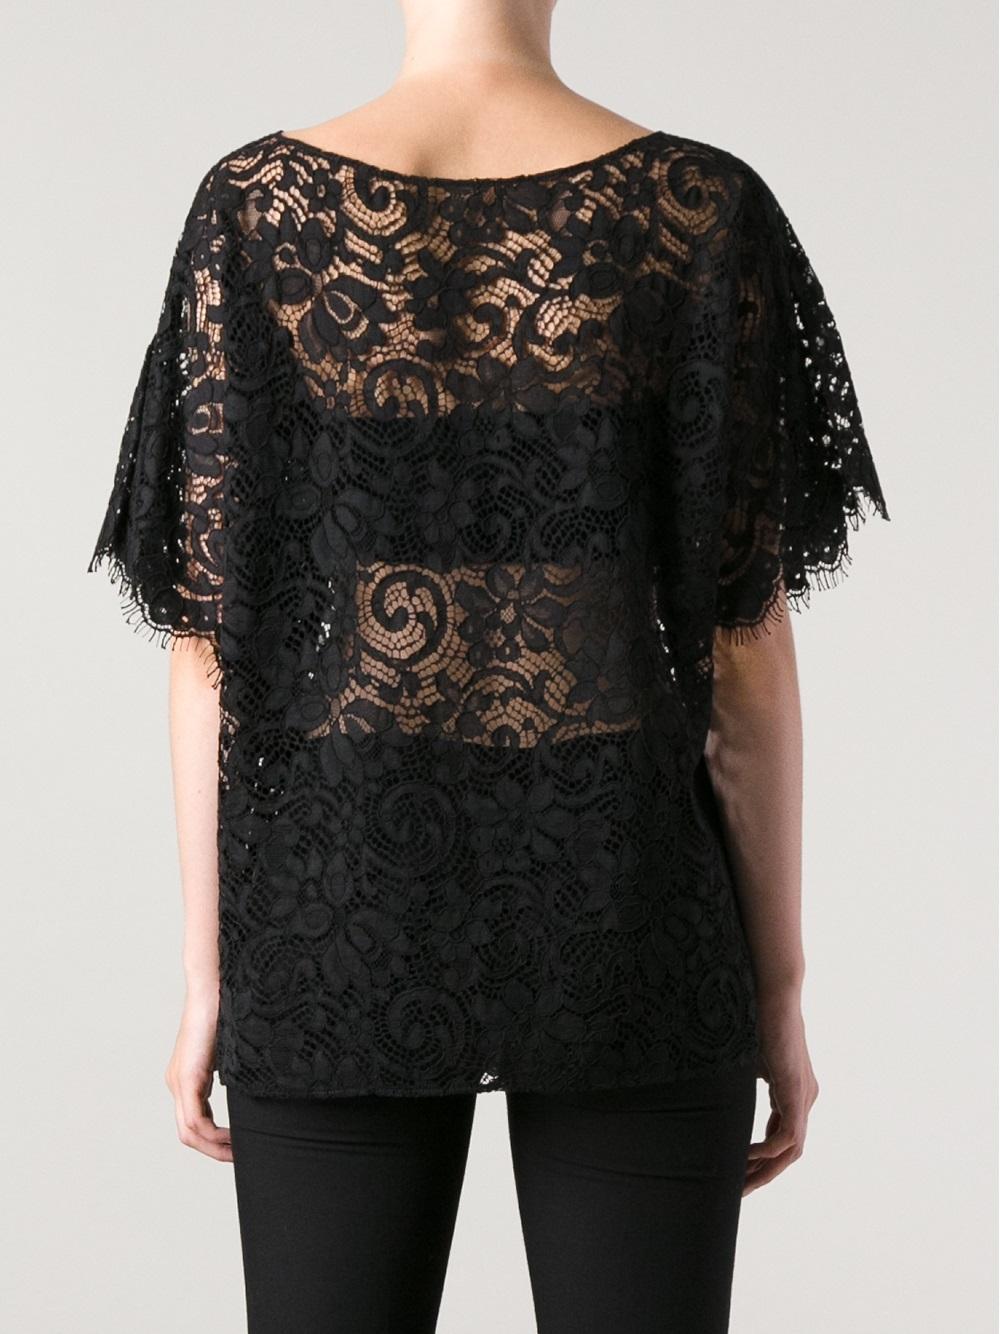 Dolce gabbana short sleeve lace tshirt in black lyst for Dolce gabbana t shirt women